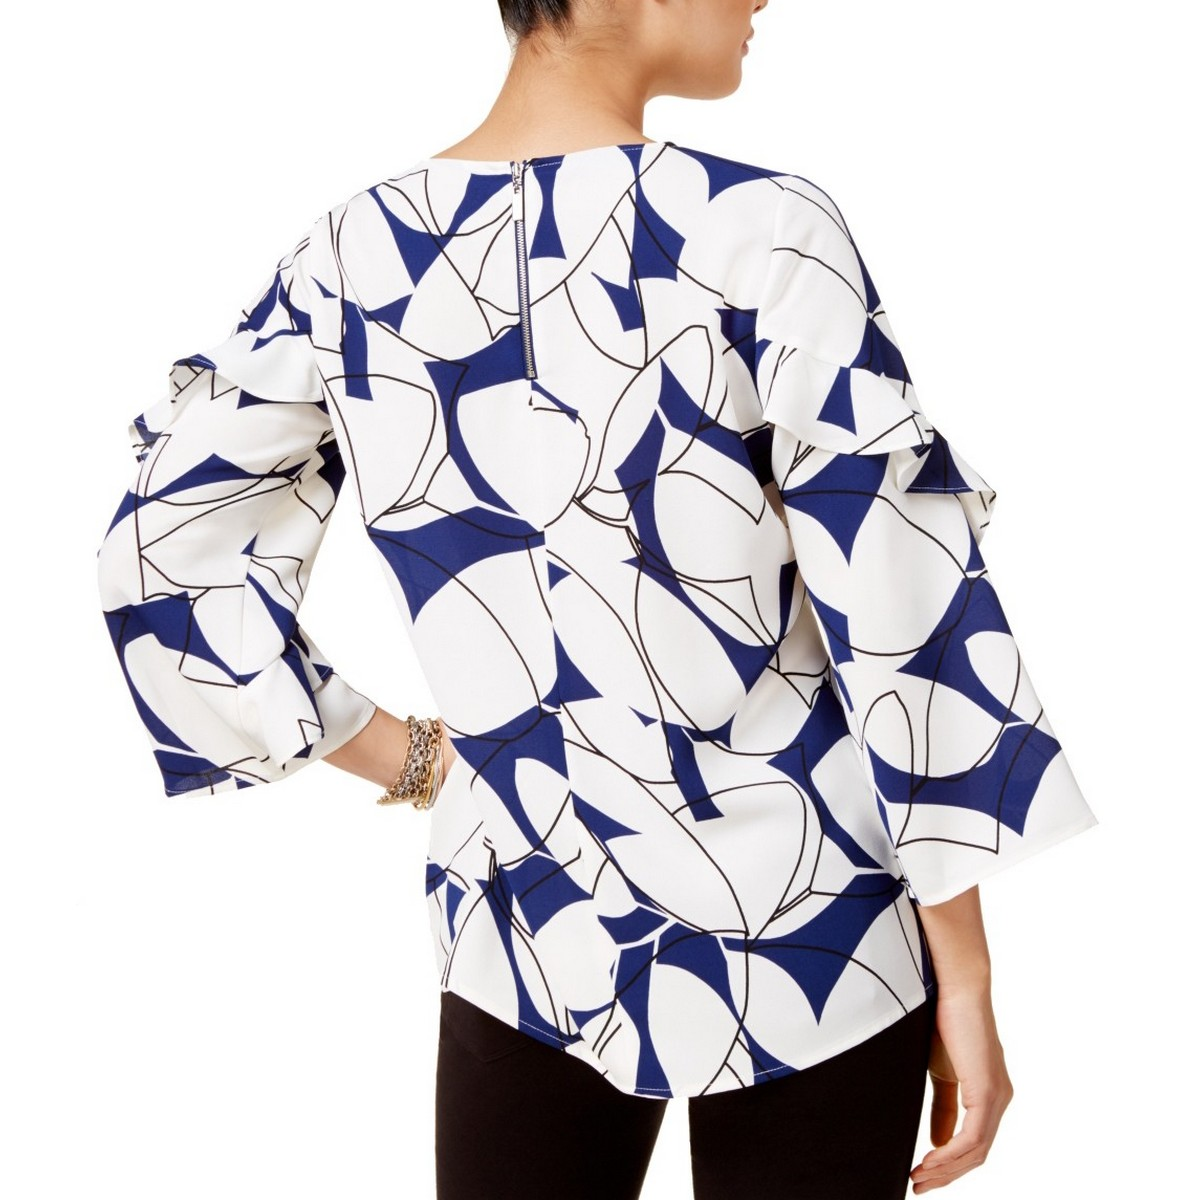 ALFANI-NEW-Women-039-s-3-4-Ruffle-Sleeve-Back-Zipper-Blouse-Shirt-Top-TEDO thumbnail 3